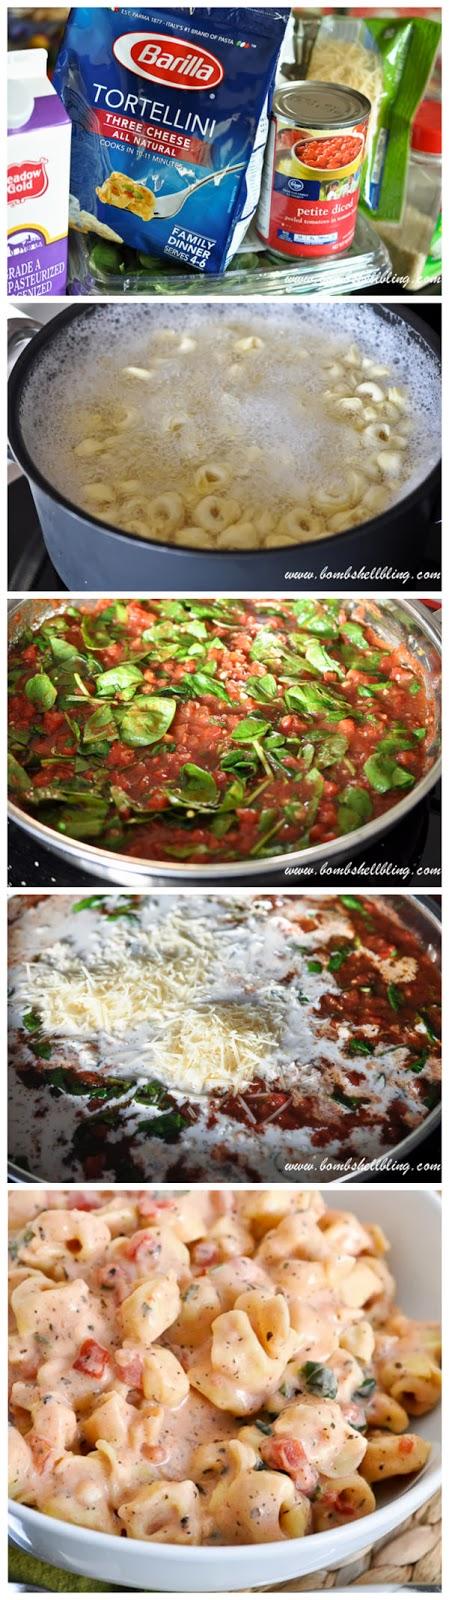 Creamy Spinach Tortellini Steps